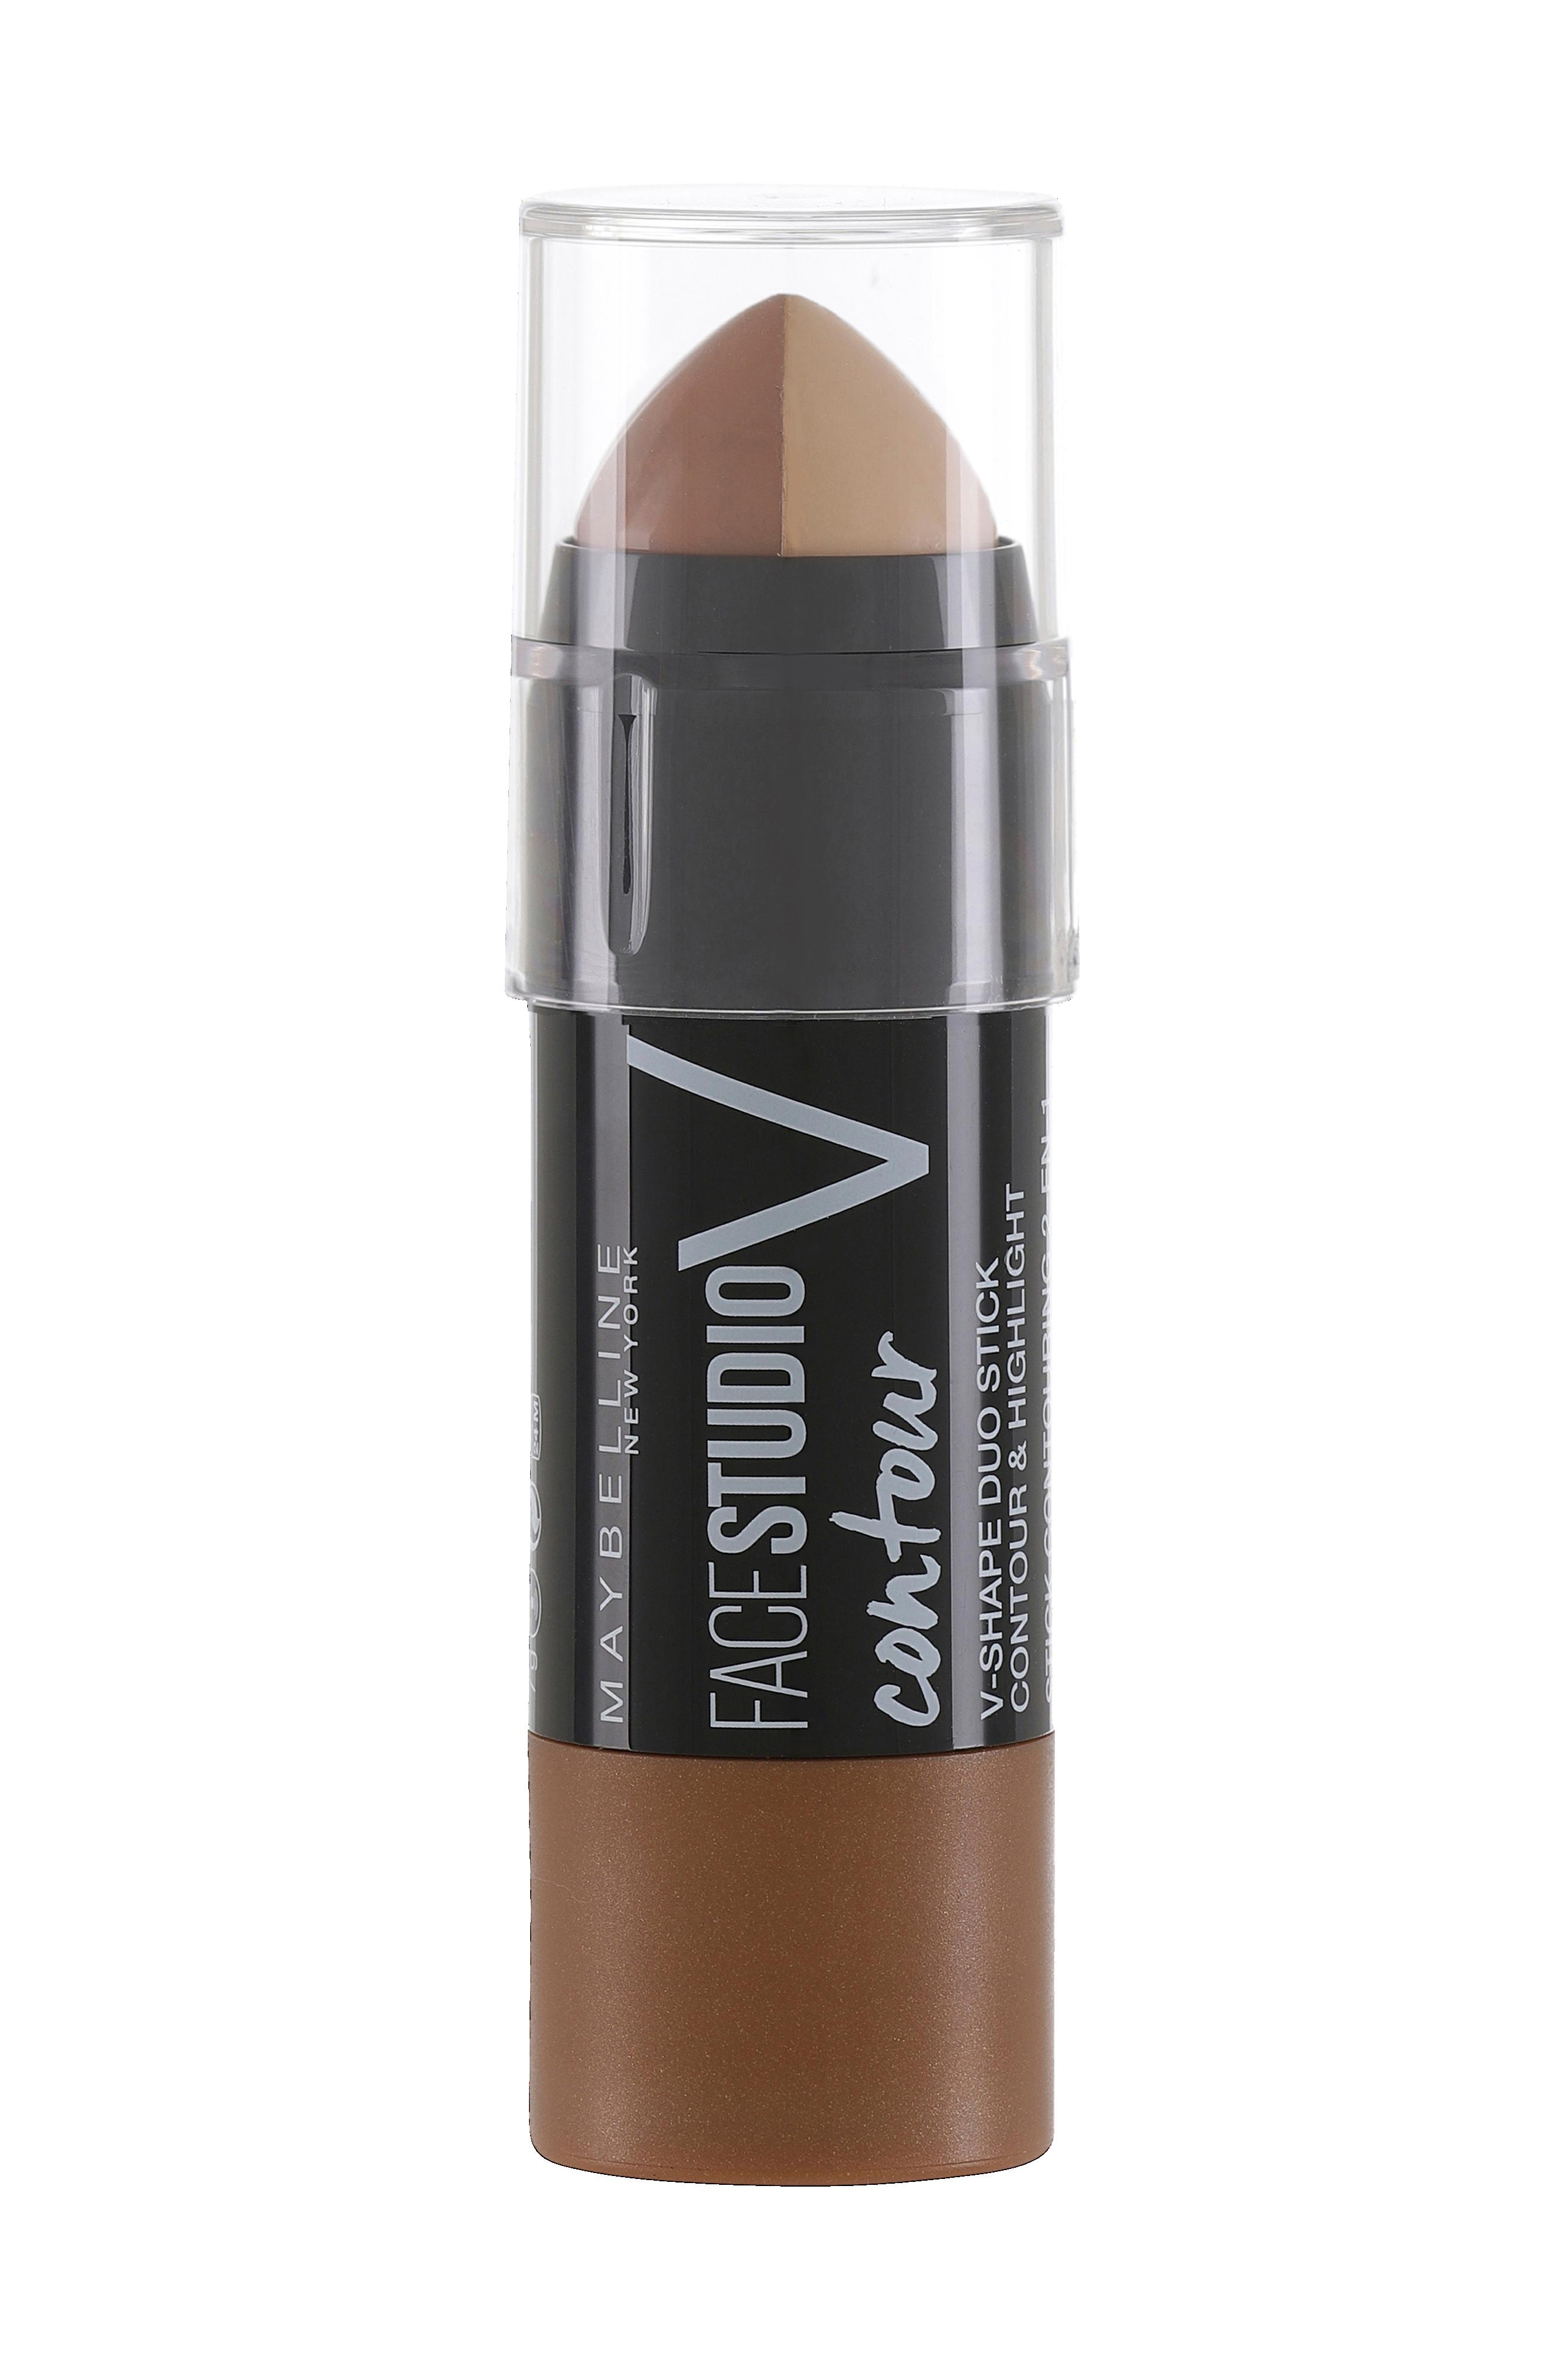 Maybelline Master Contour V Shape Duo Stick Light Available Via Face Studio Powder 01 Med Countour